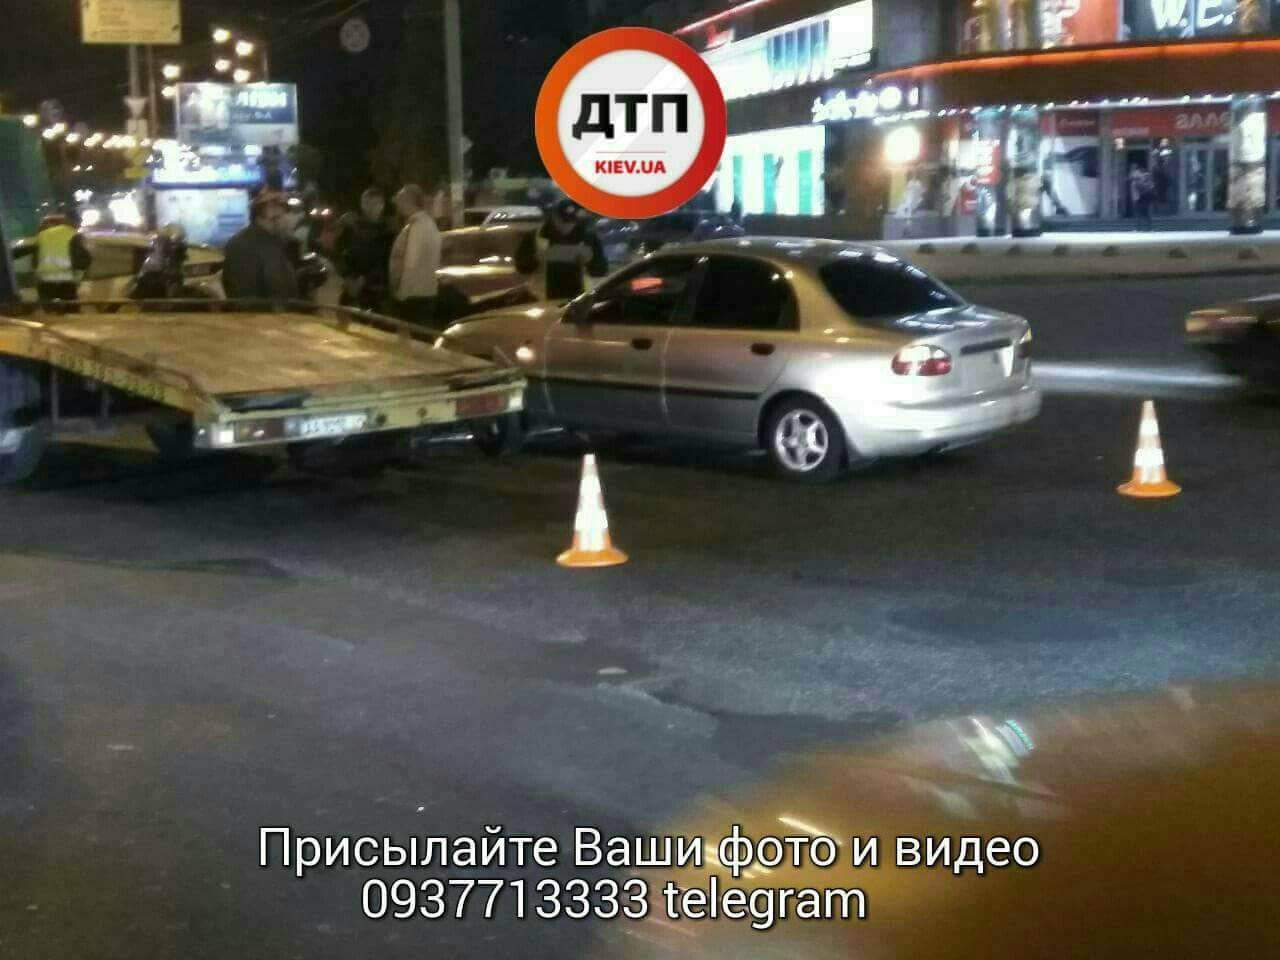 В Киеве произошло столкновение мотоцикла и легковушки (фото)